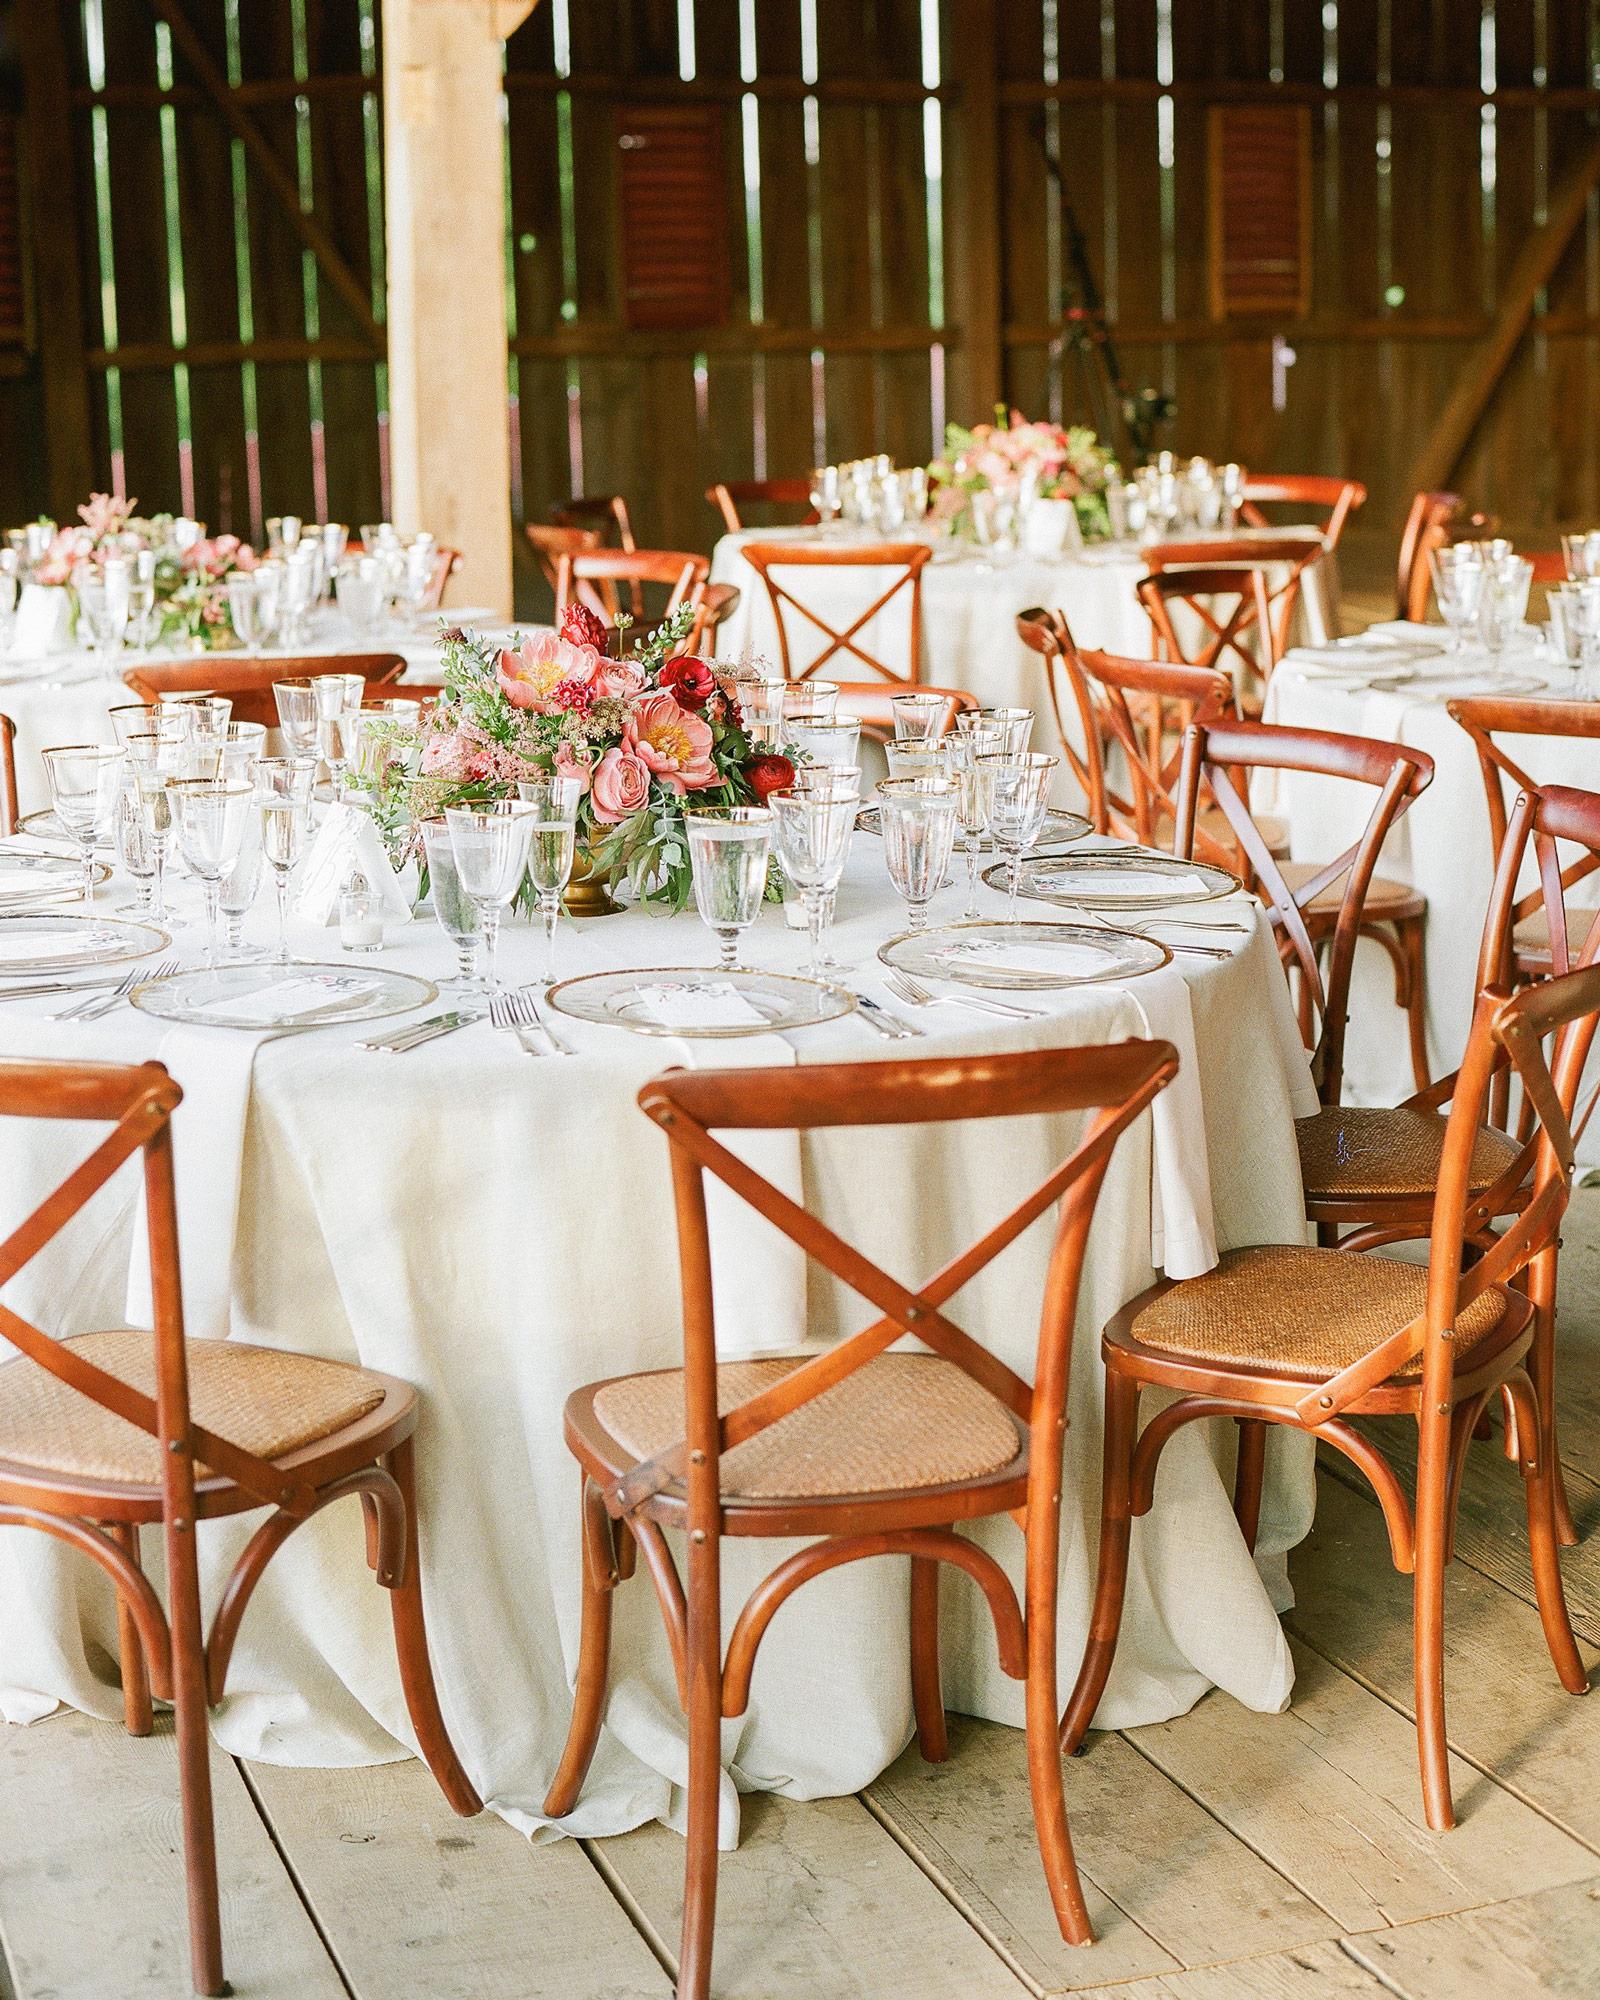 sasha-tyler-wedding-virginia-table-16-s112867.jpg